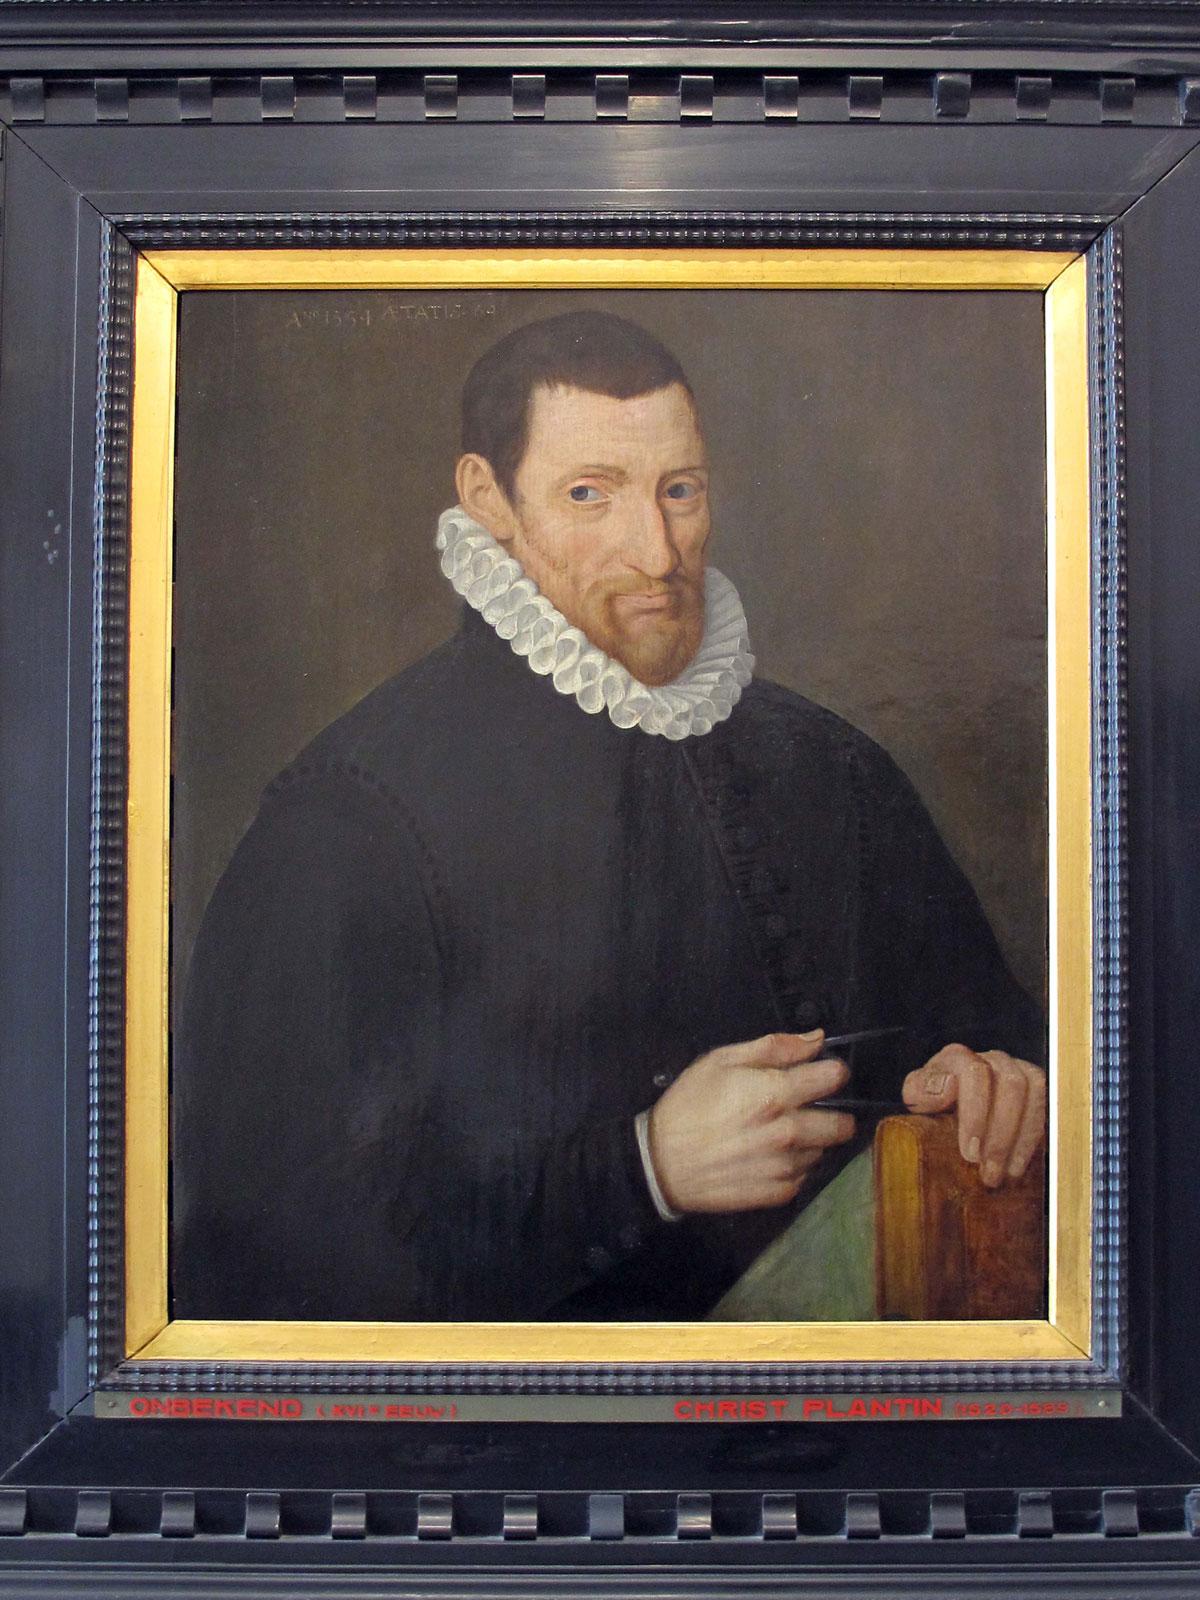 Portrait of Christophe Plantin by Rubens